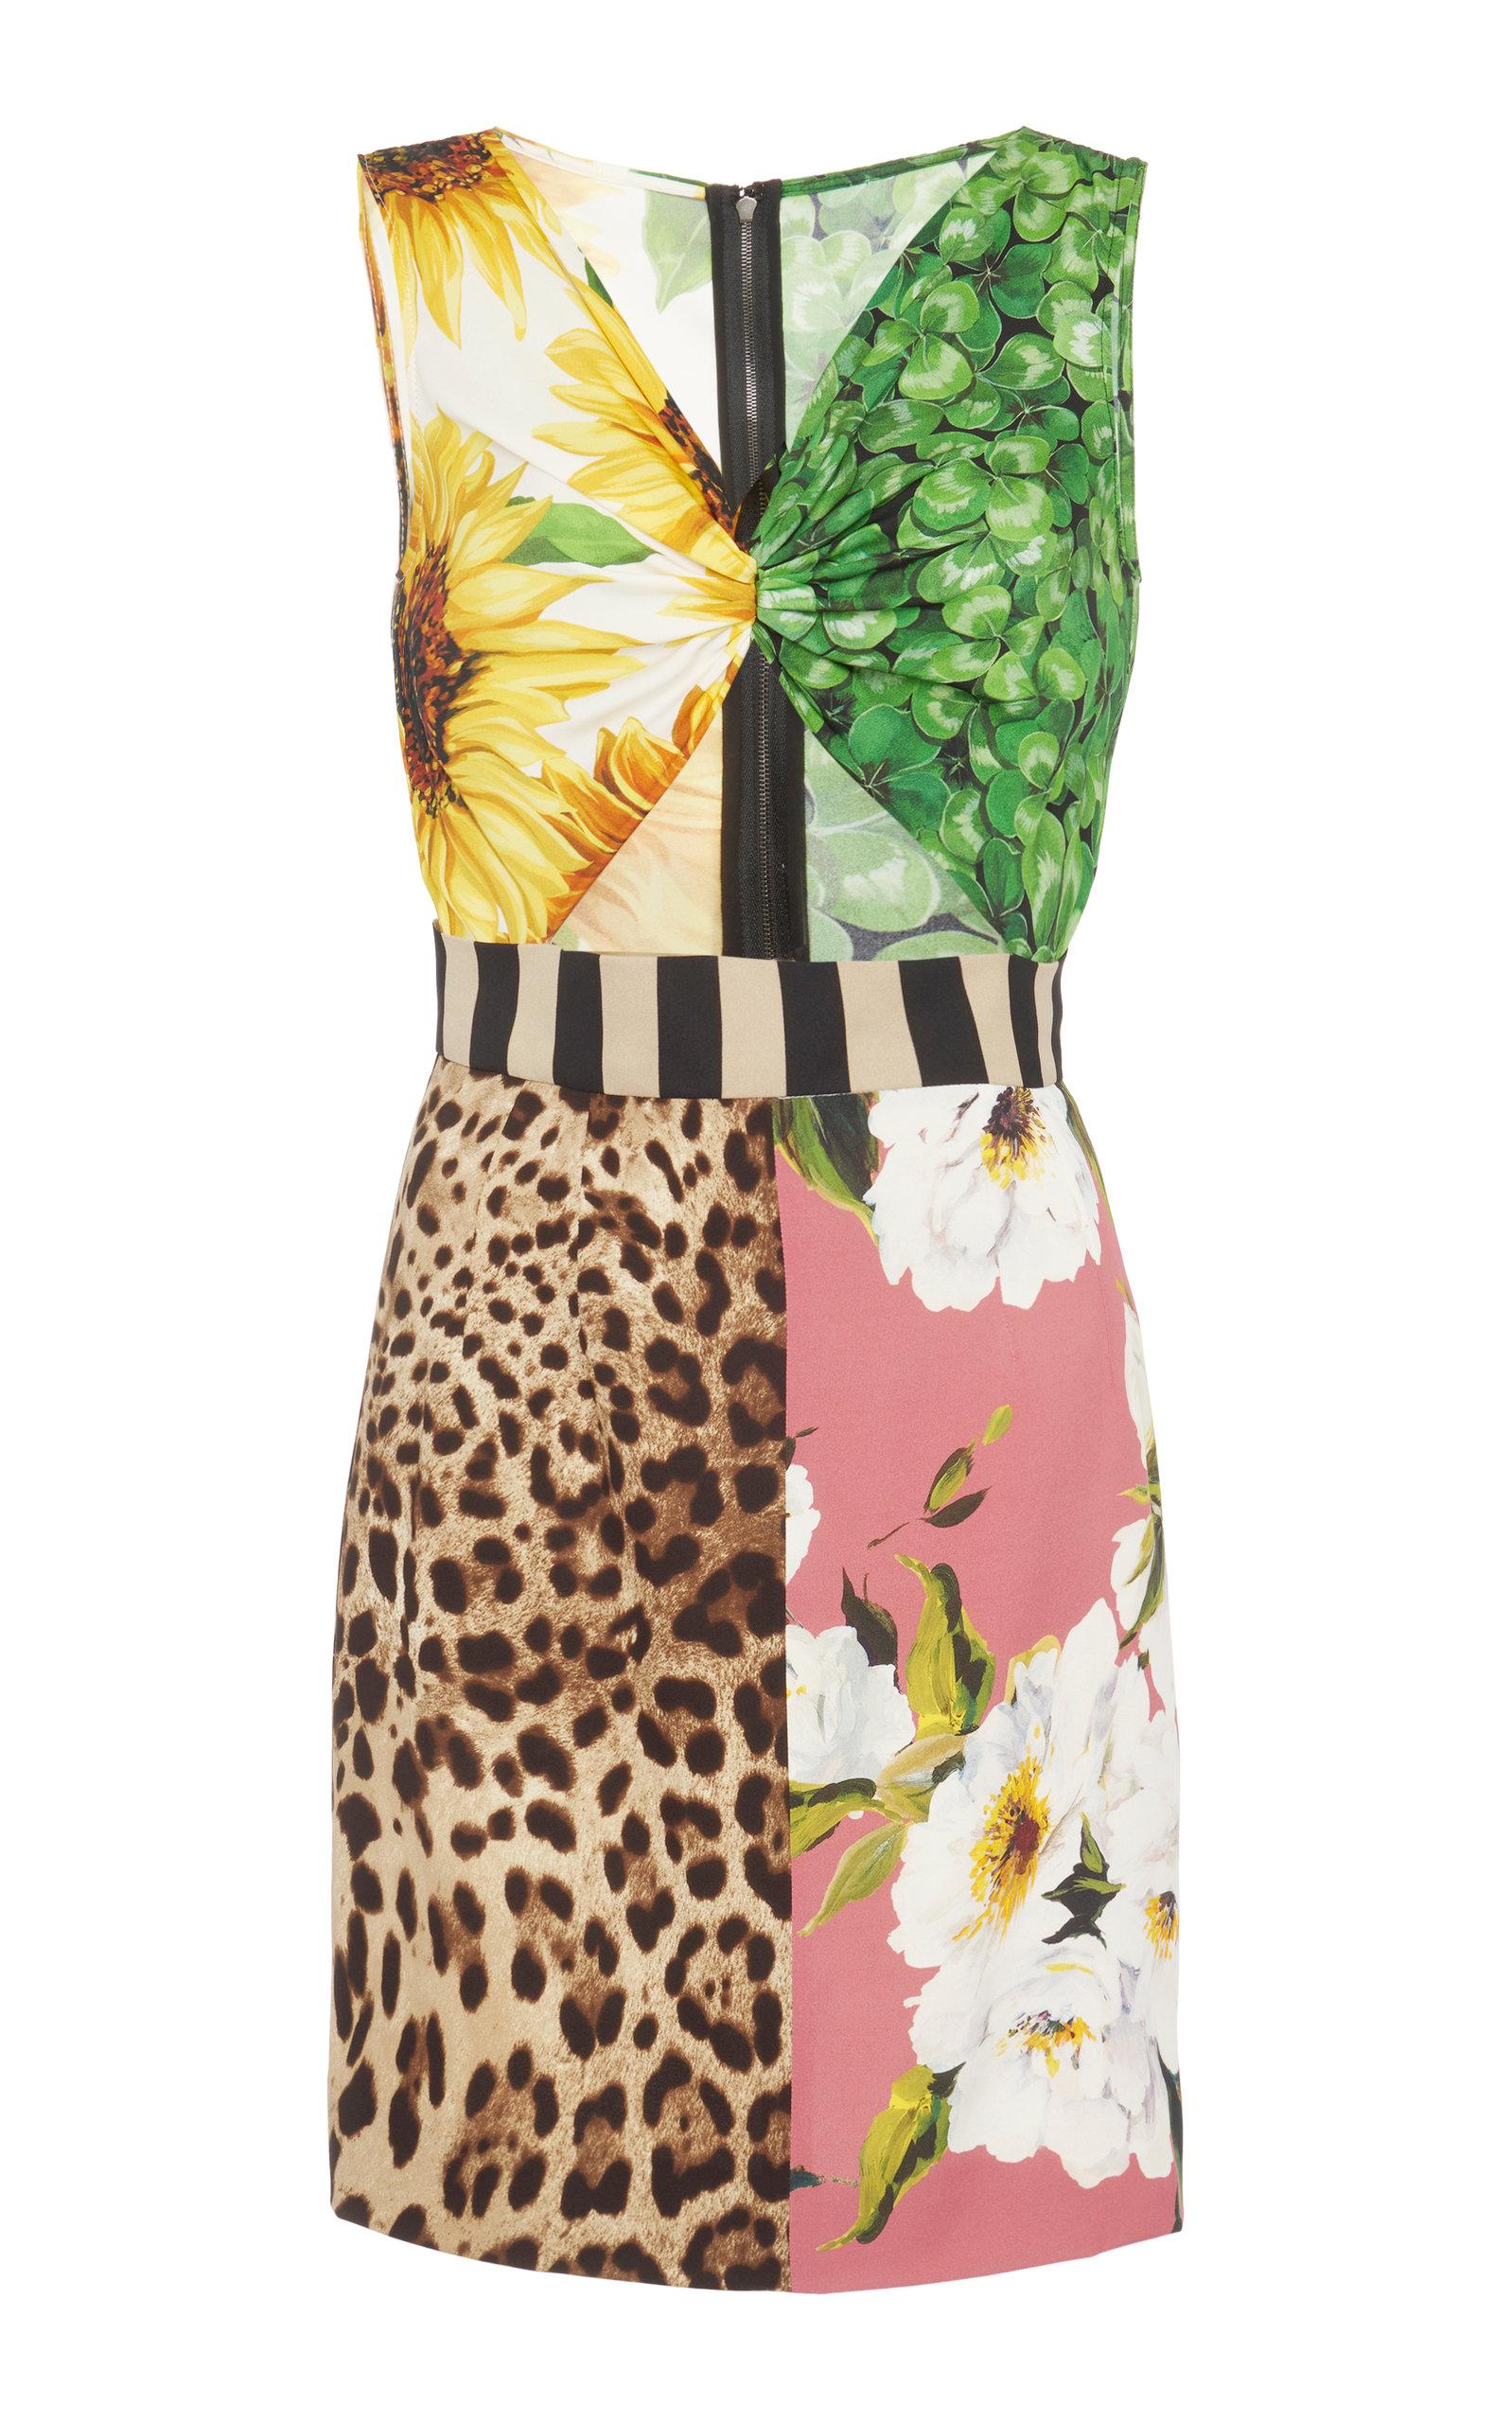 Dolce & Gabbana WOMEN'S CUTOUT PATCHWORK-PRINTED SILK MINI DRESS